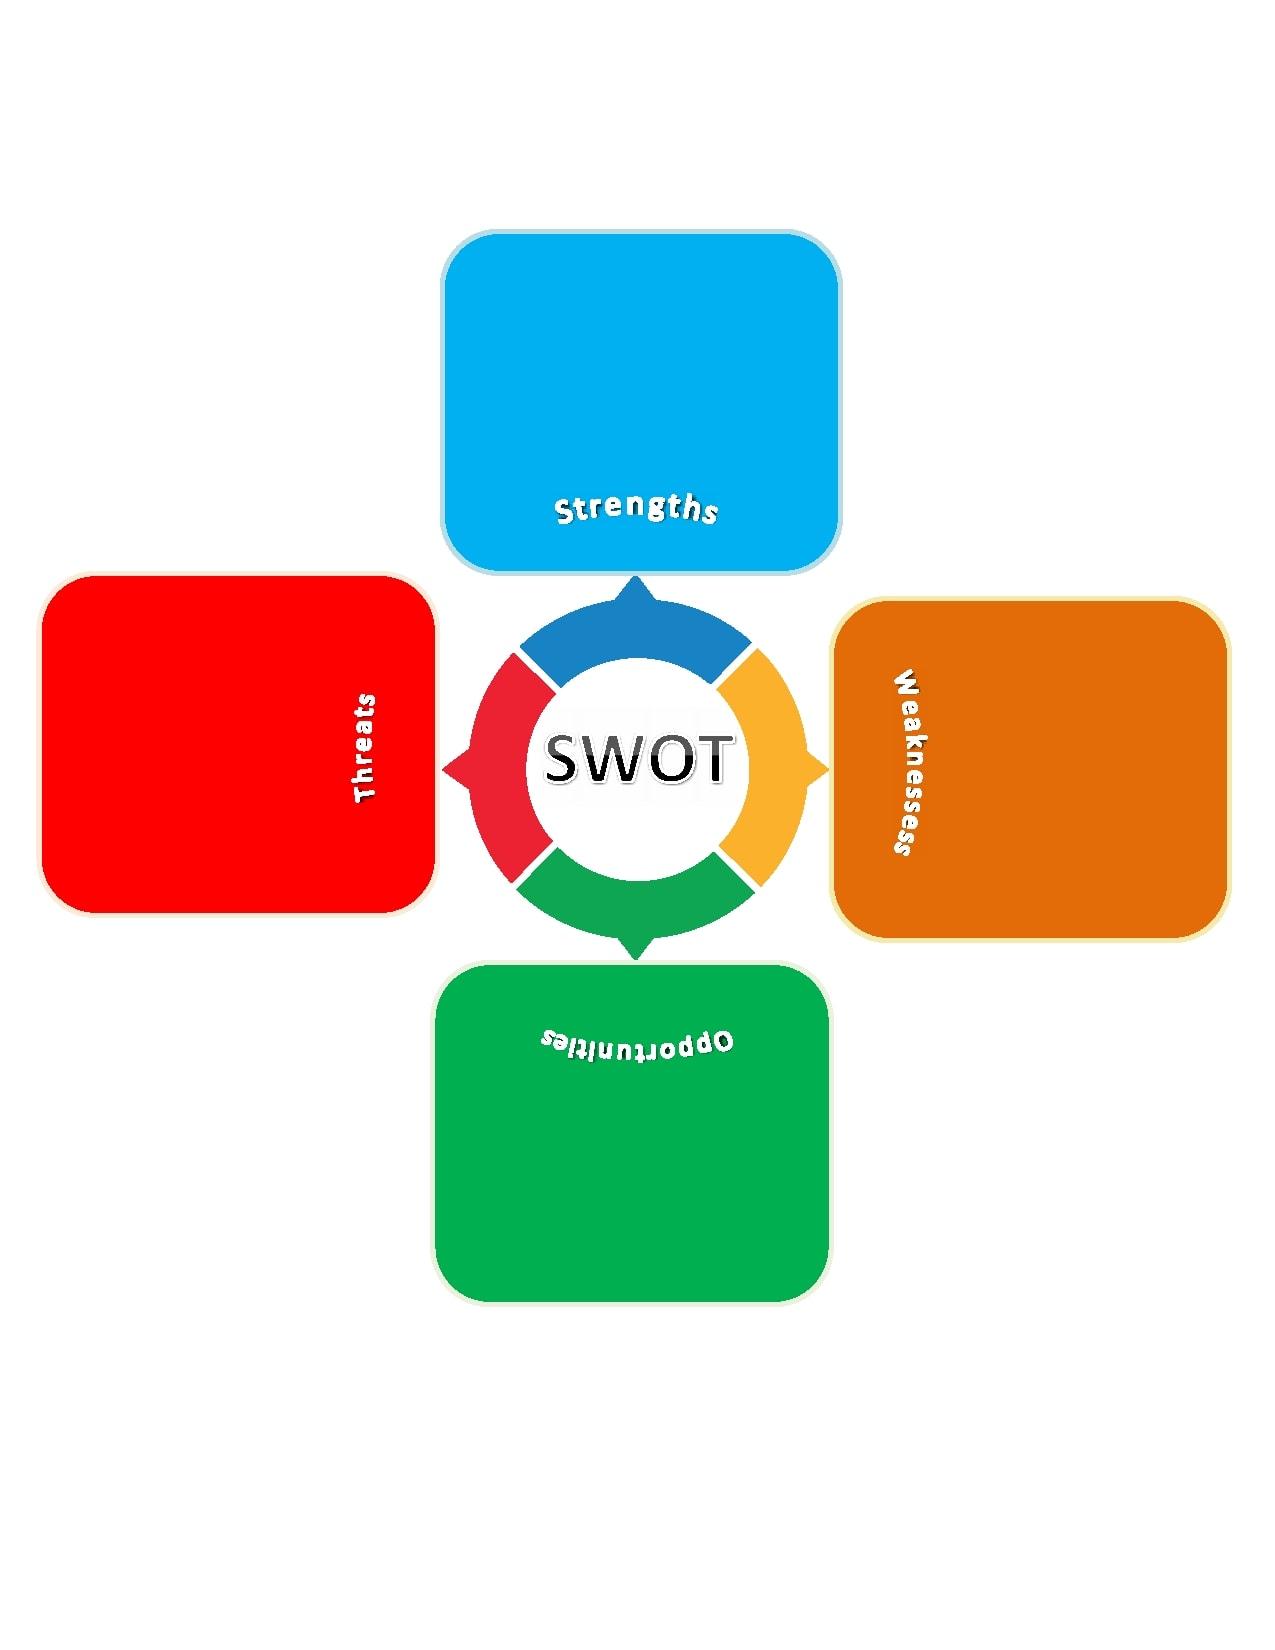 swot analysis template 14